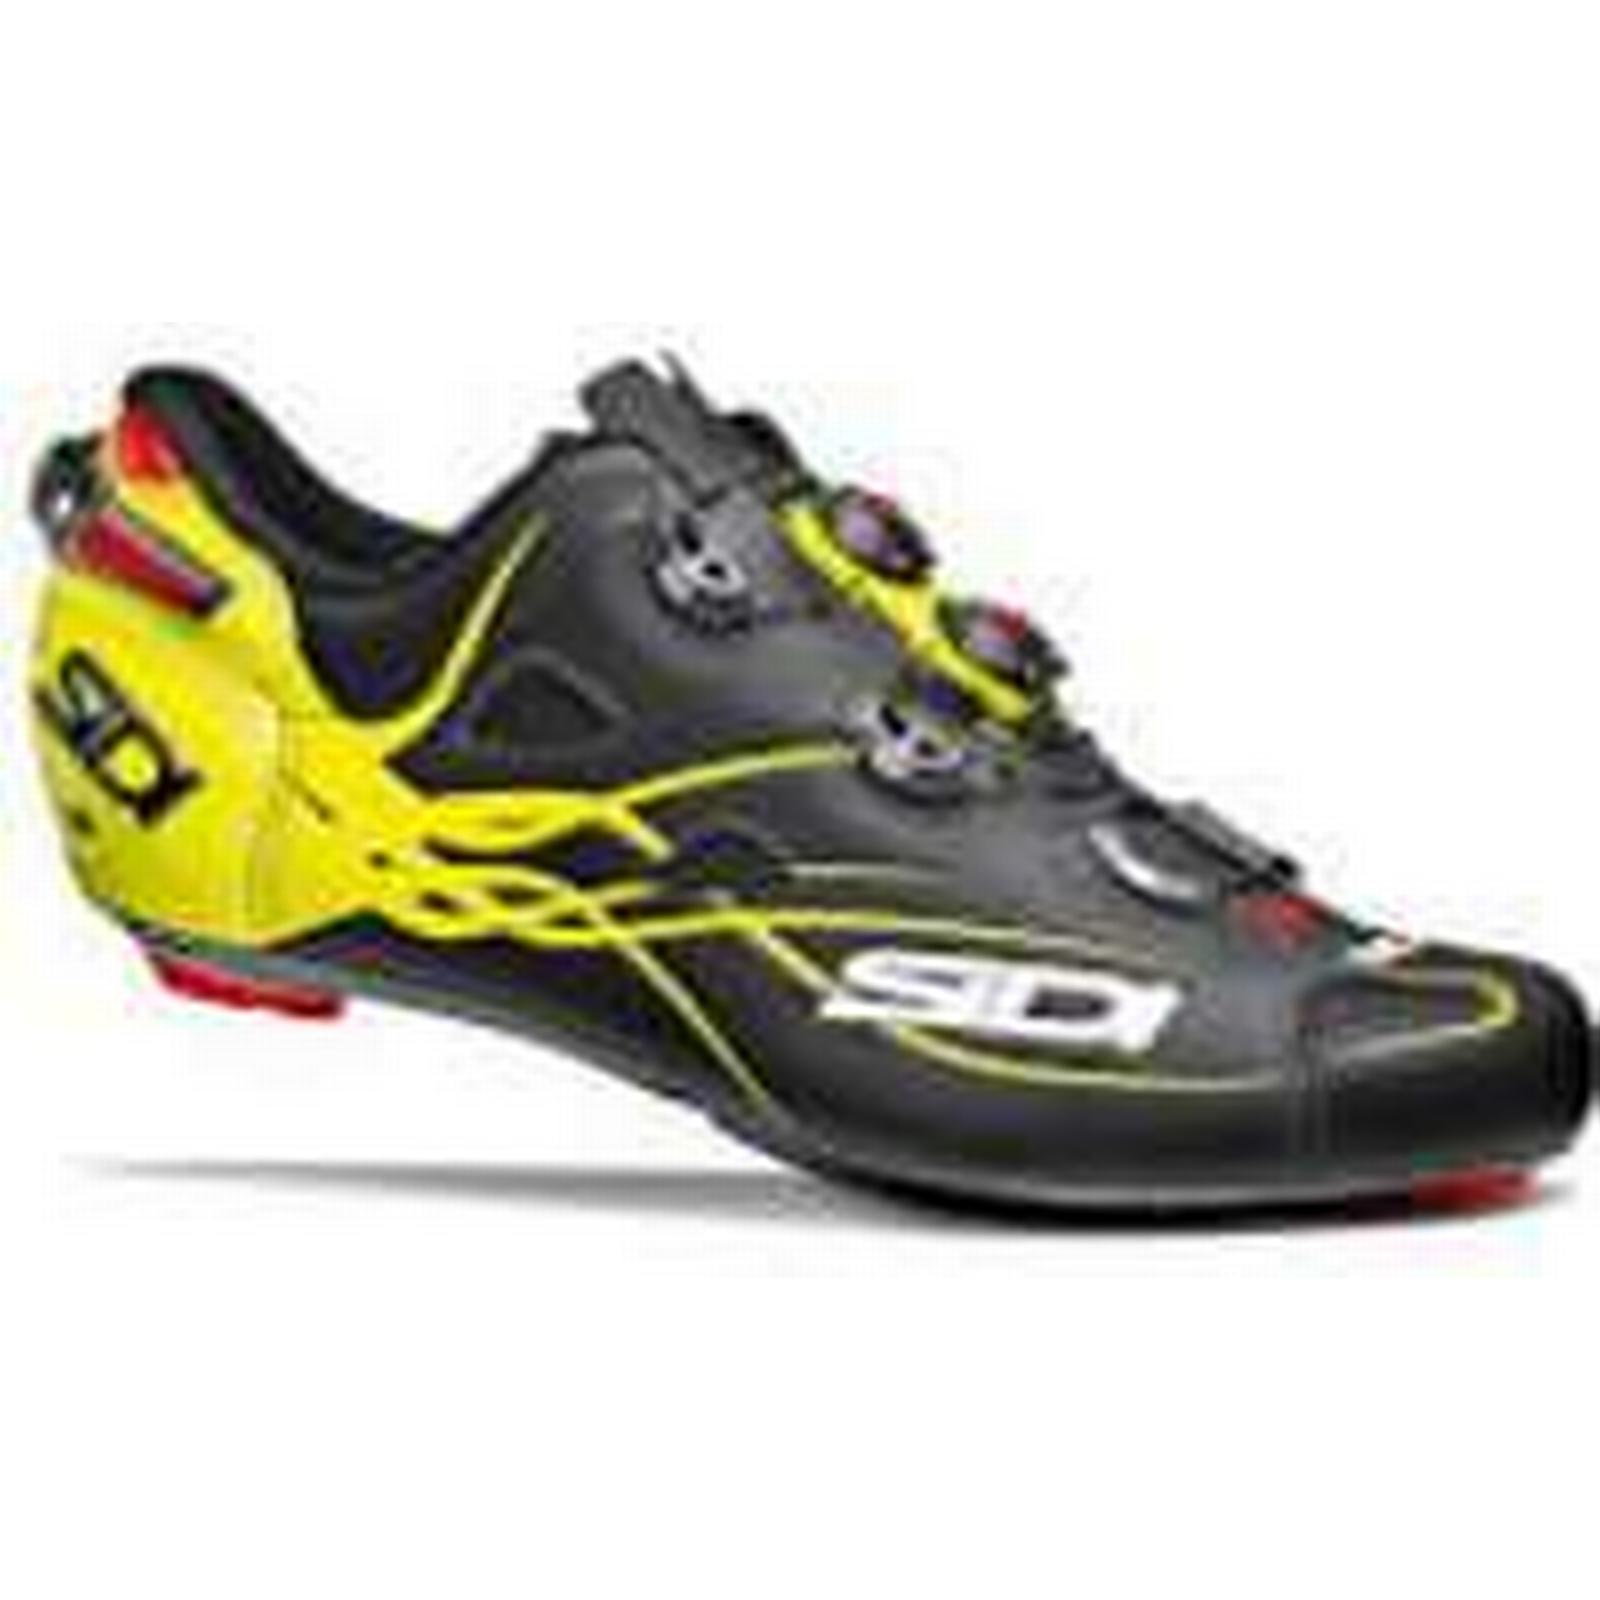 Sidi Shot Matt Road Shoes - Matt 45 Black/Yellow Fluo - EU 45 Matt - Matt Black/Yellow Fluo 083faa